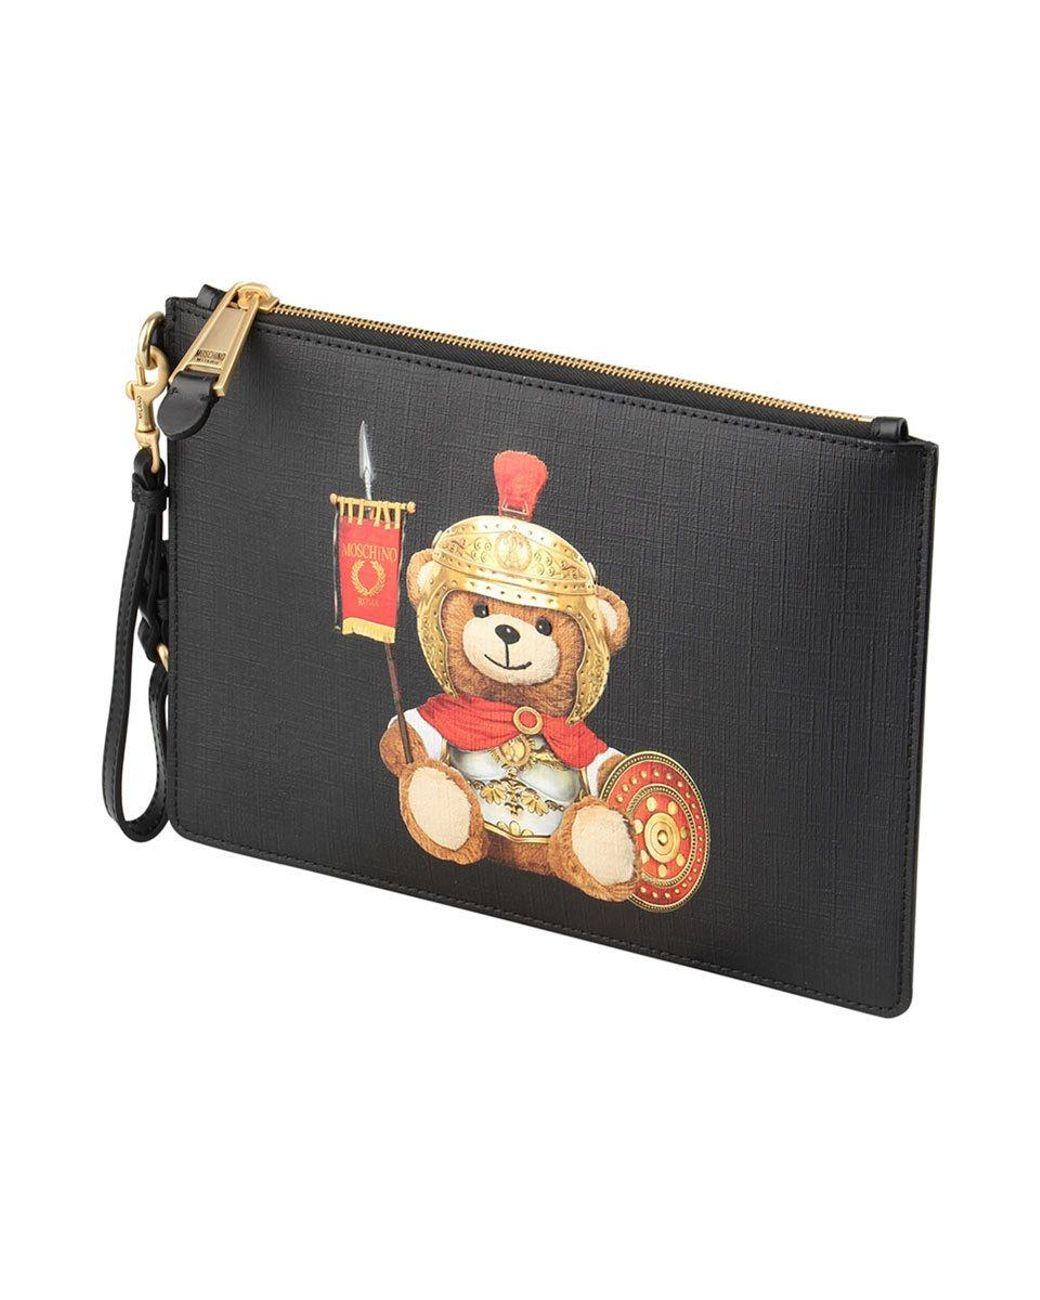 gran venta 15359 0033e Women's Bolso Clutch Teddy Bear Romano